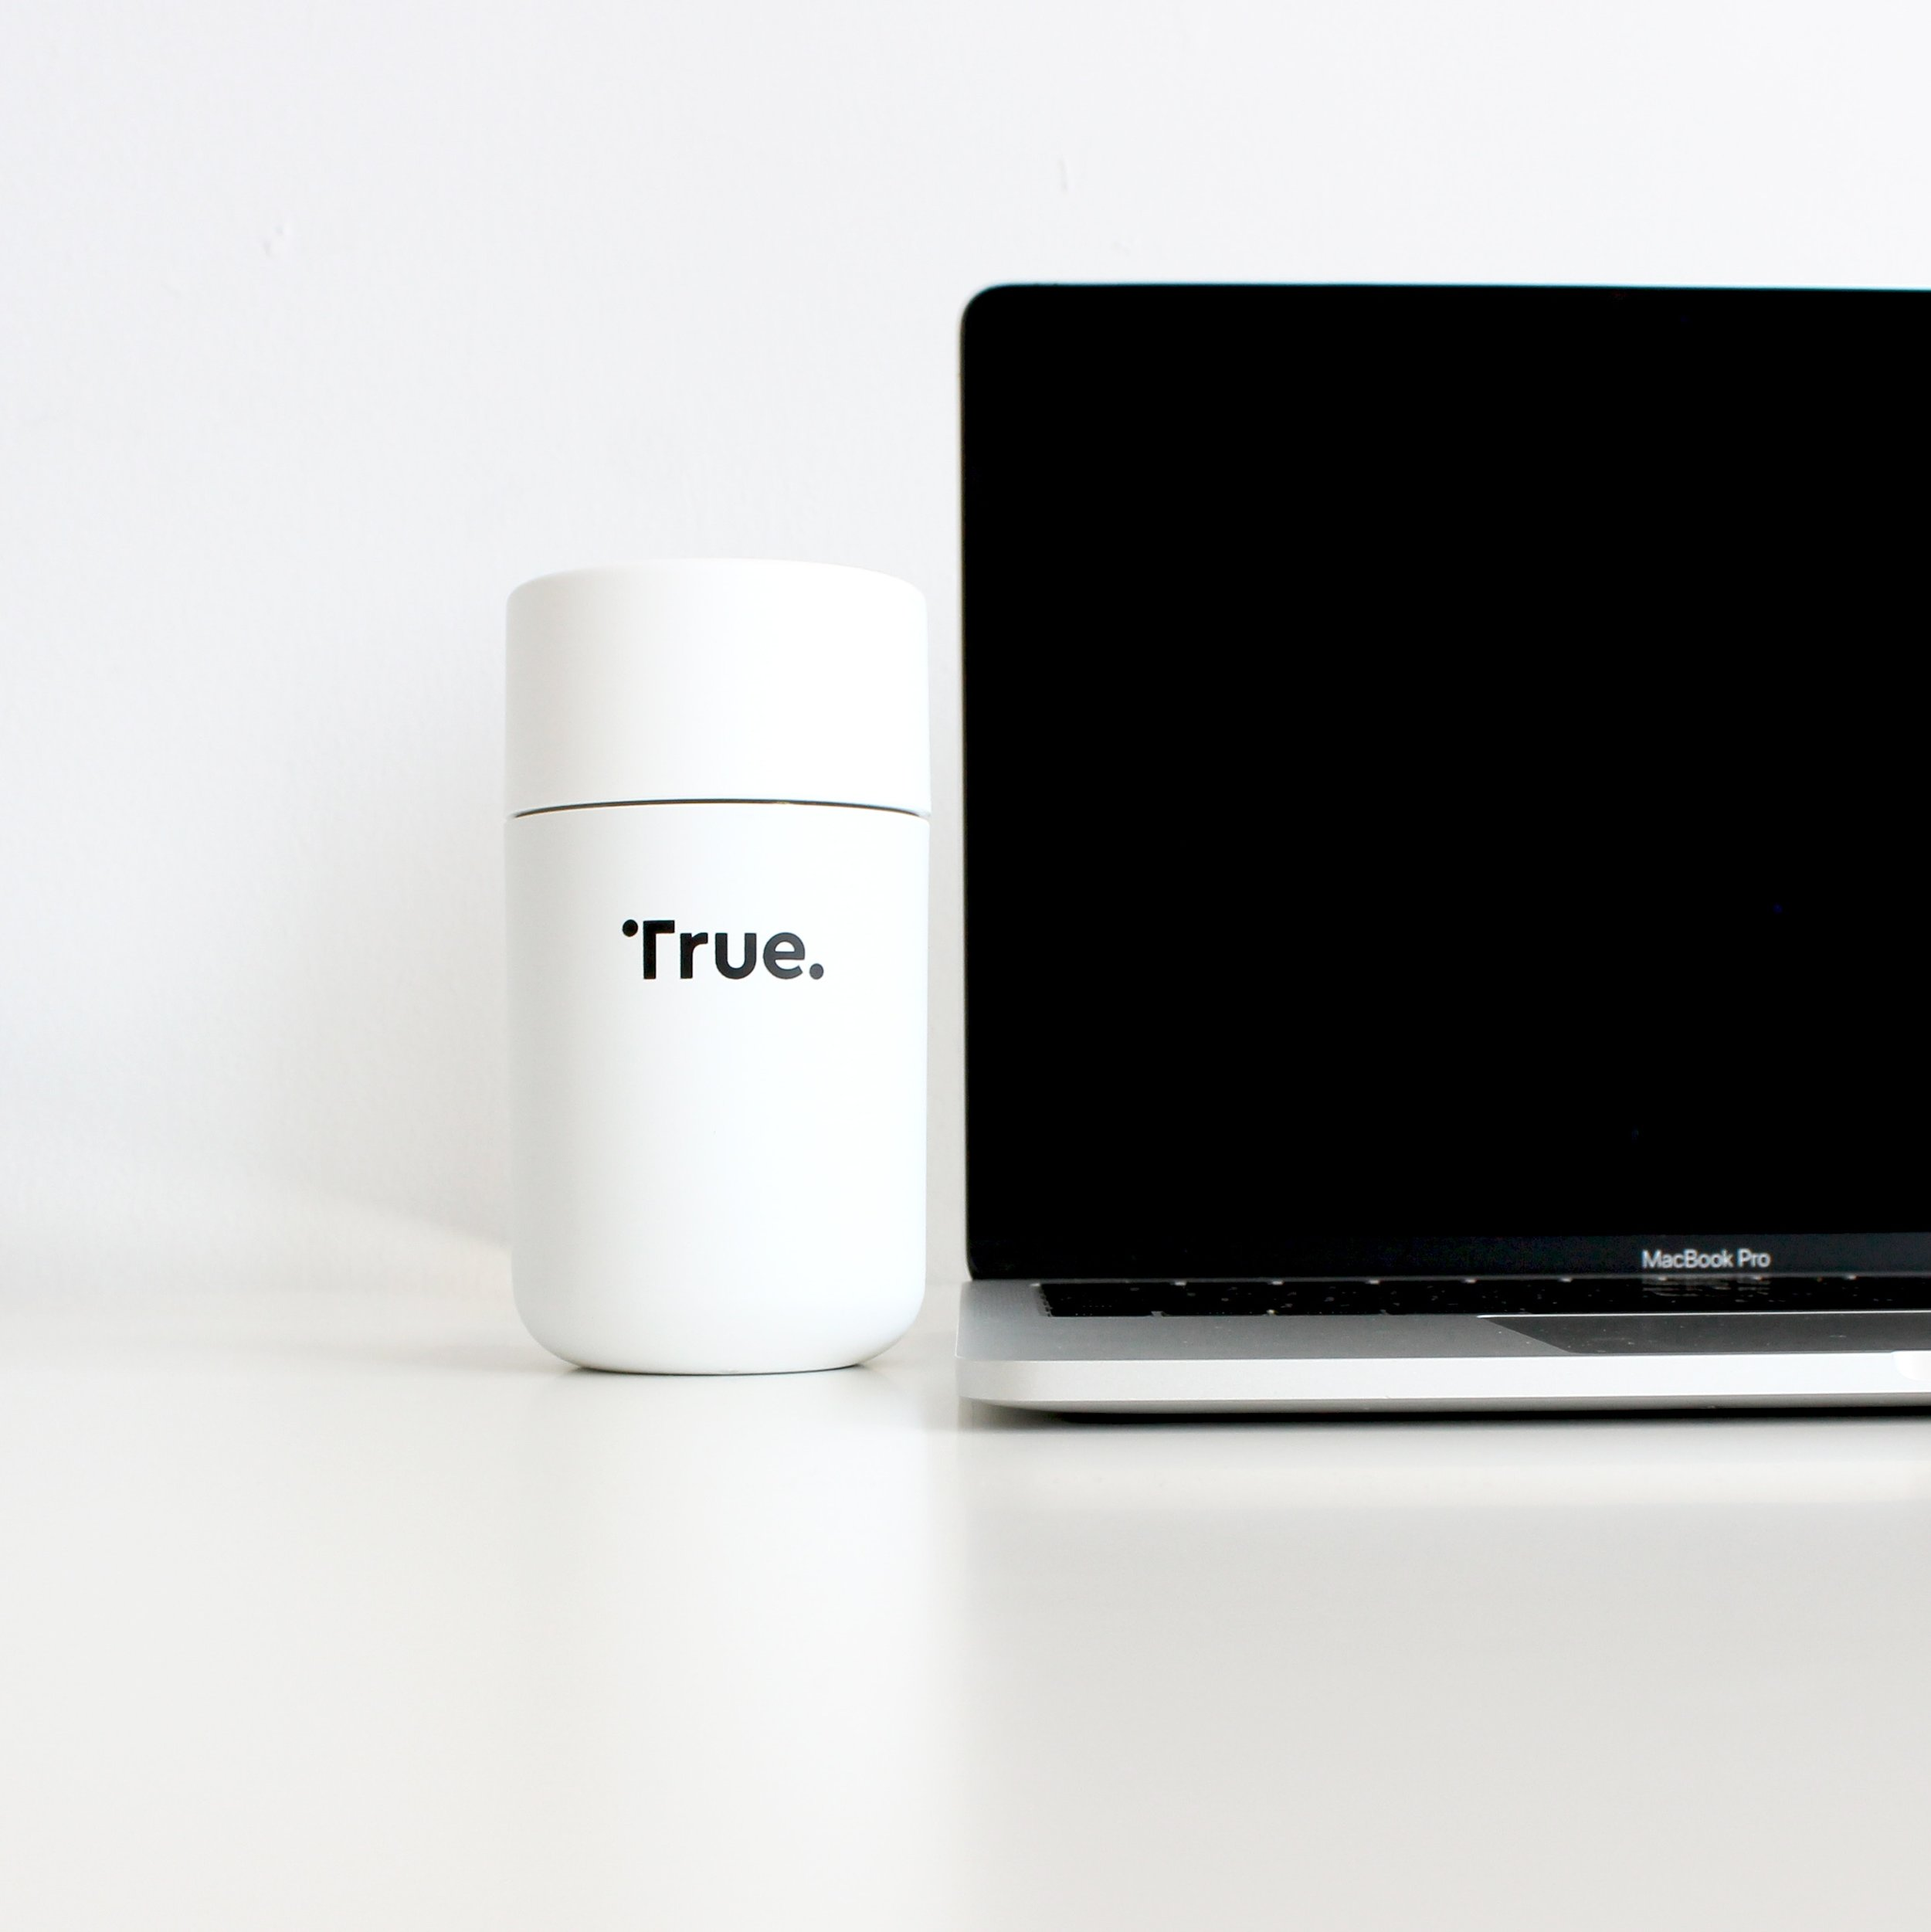 true-agency-804530-unsplash.jpg